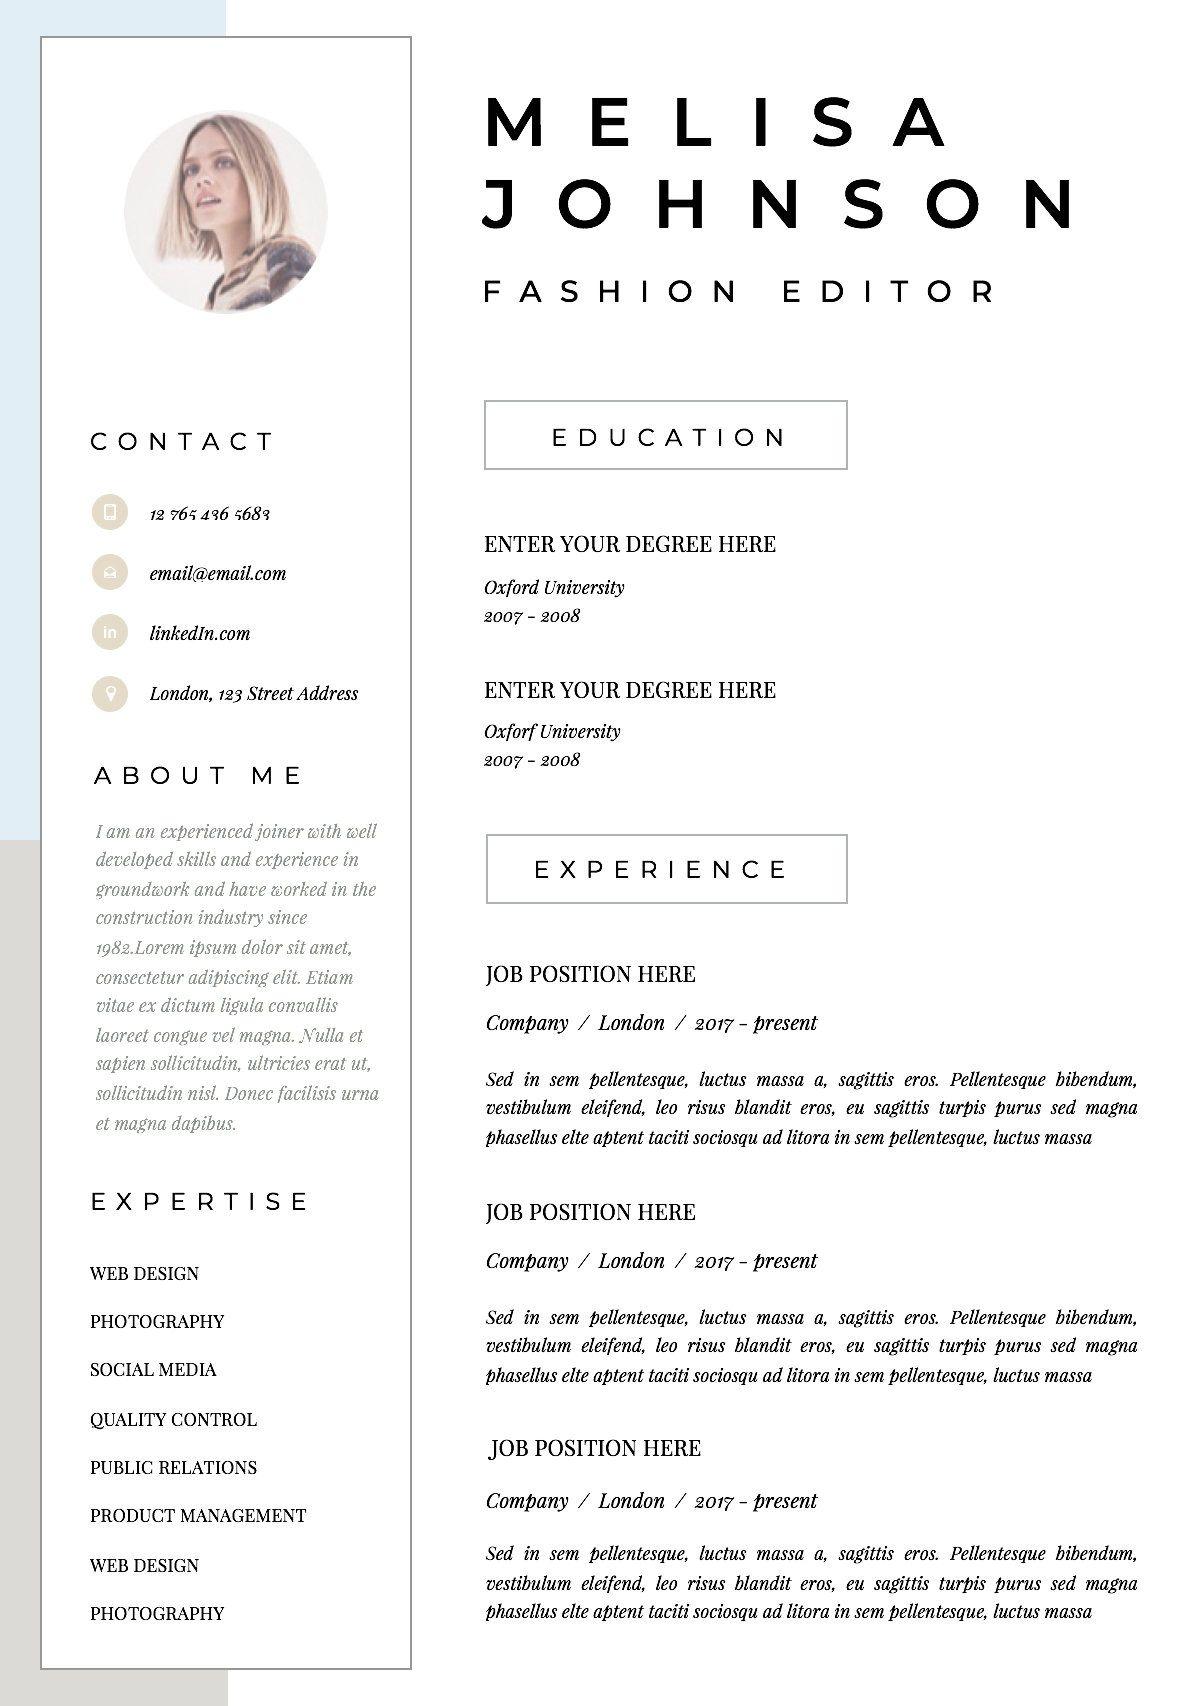 Resume Template Cv Template Resume Cv Design Teacher Etsy Cv Template Cv Design Resume Design Template